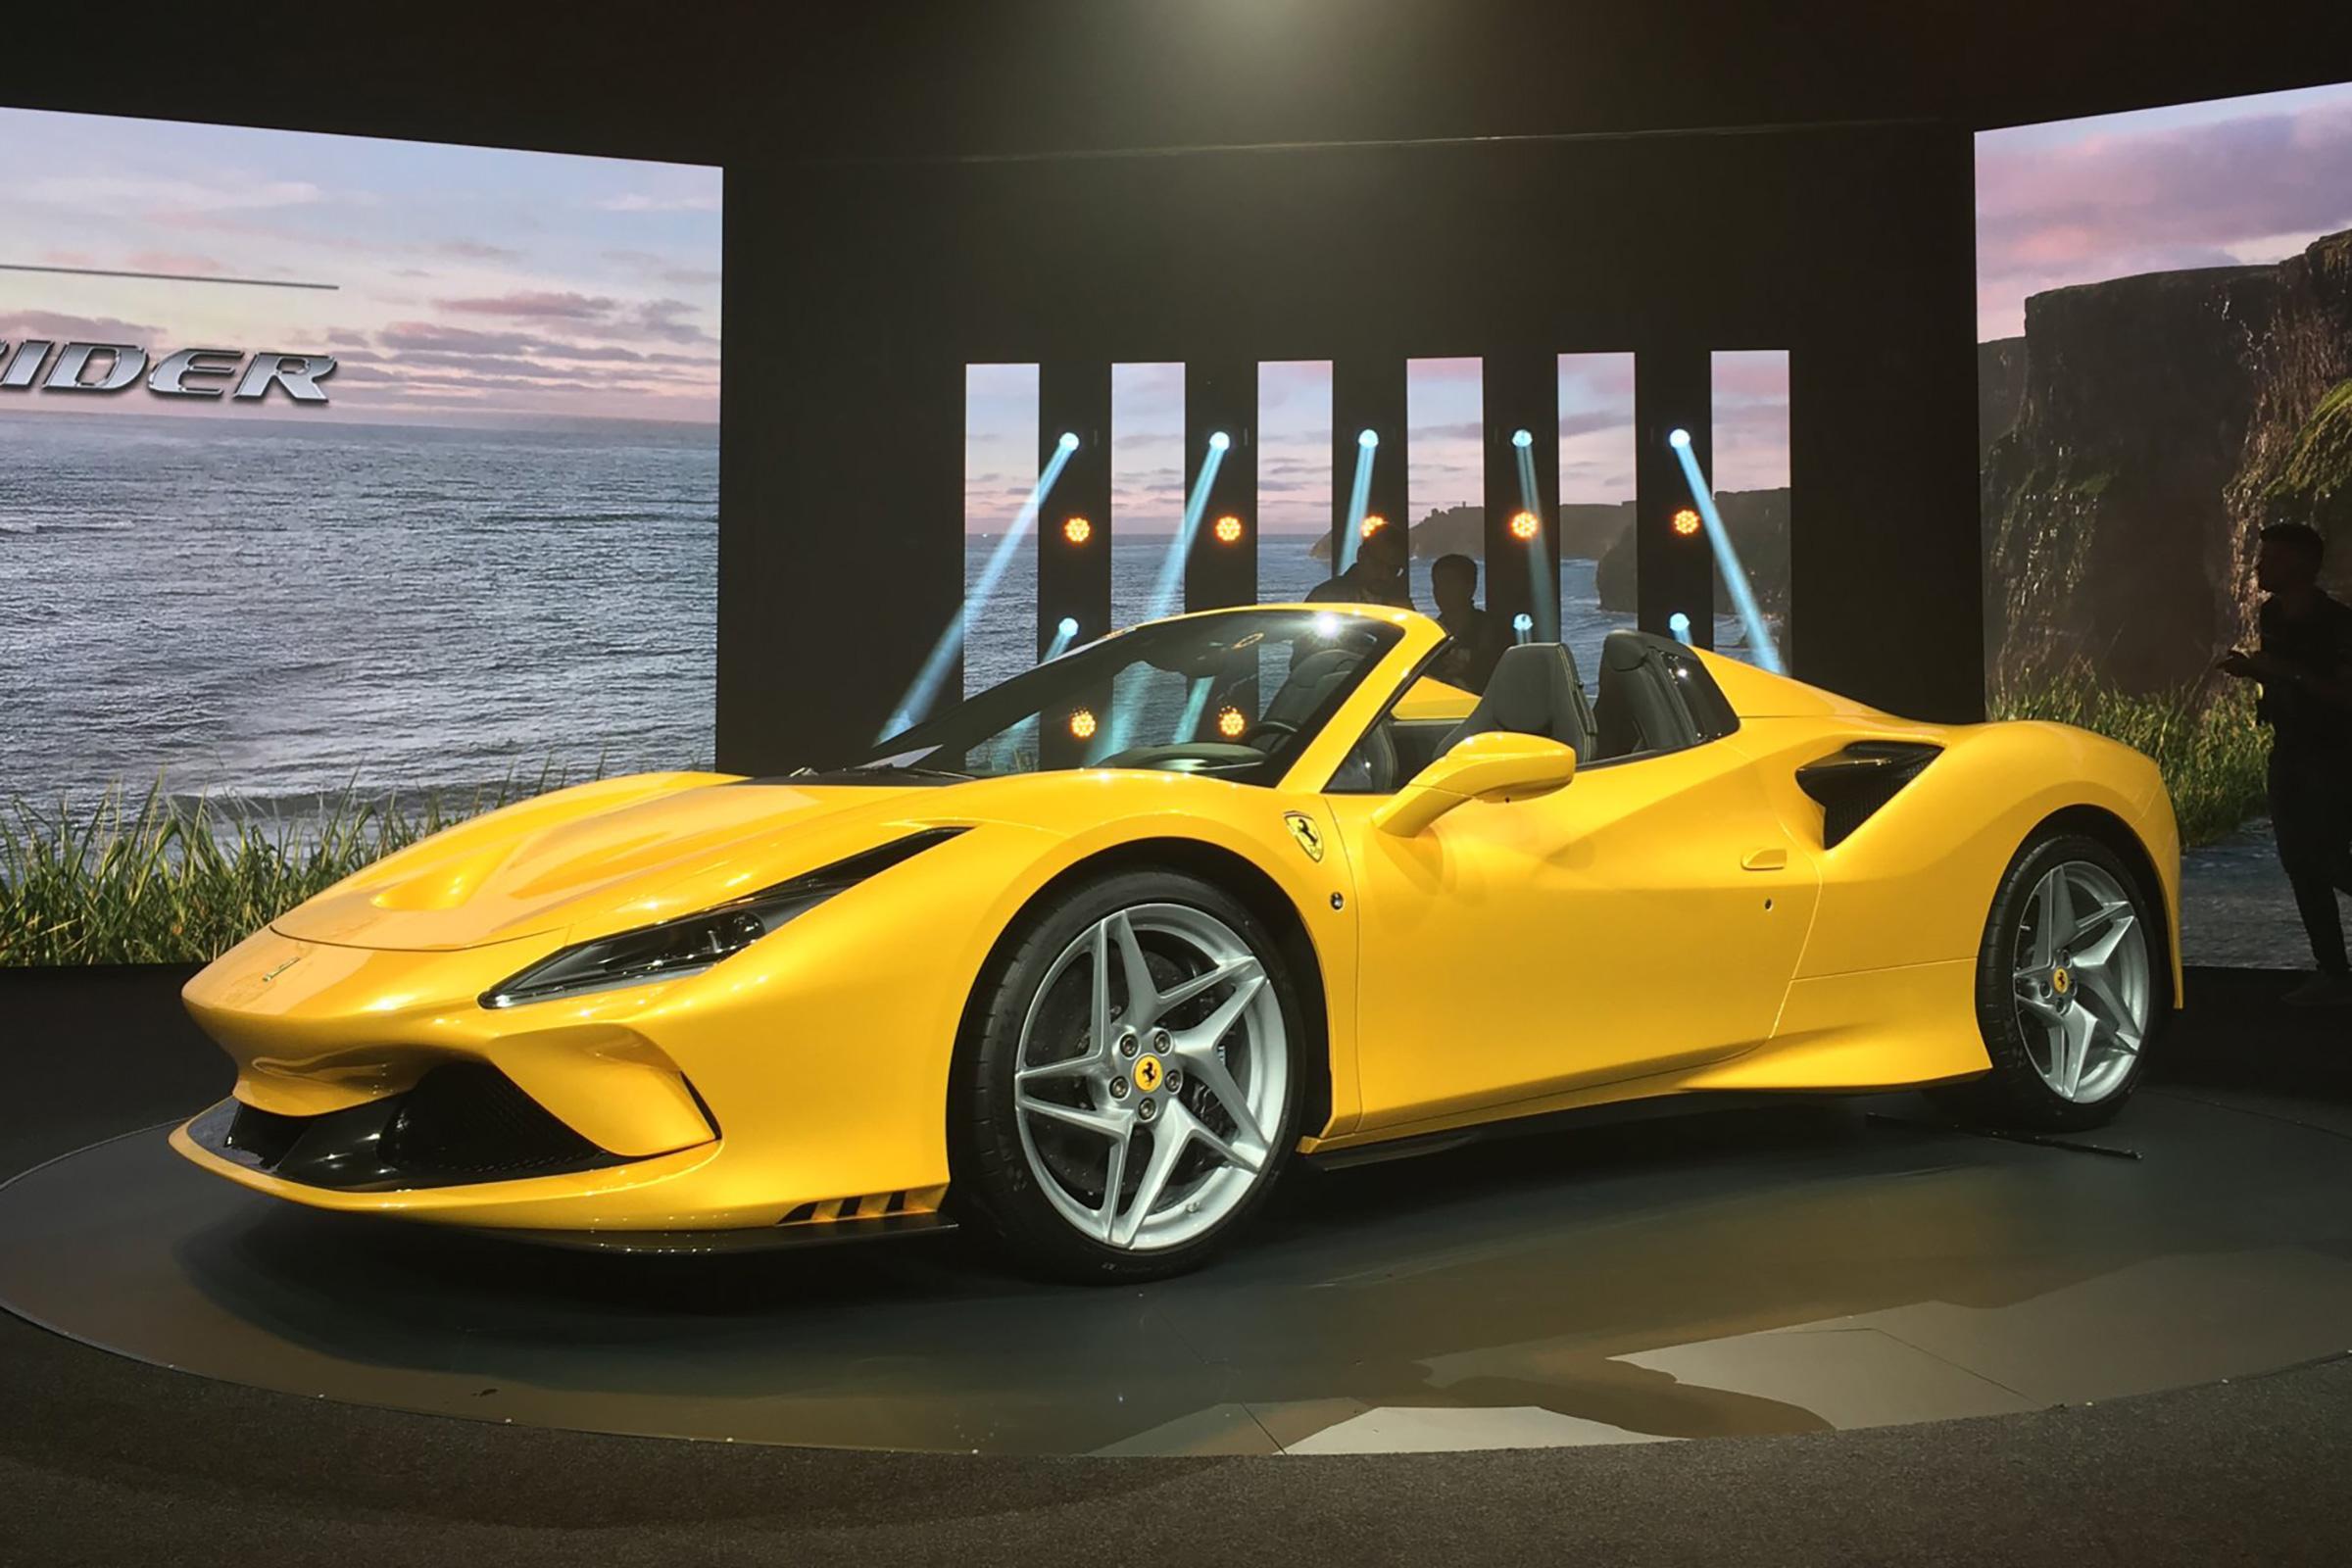 New Ferrari 812 Gts Revealed V12 Convertible Ready To Roar Evo